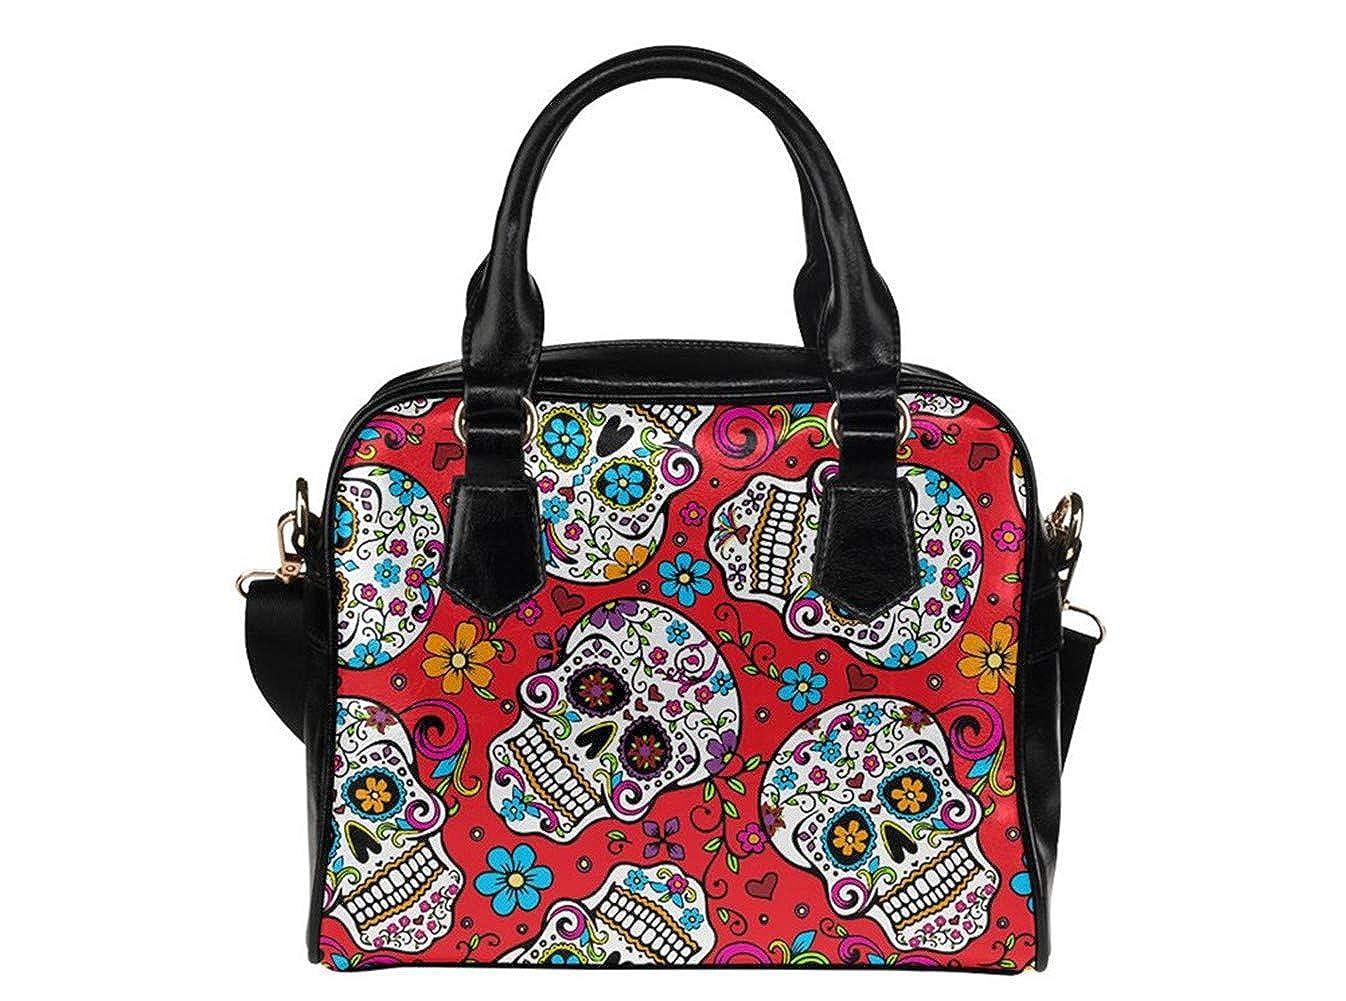 Colorful Sugar Skull Pattern Womens Leather Handbags Totes Top Handle Shoulder Bag Satchel Ladies Purses